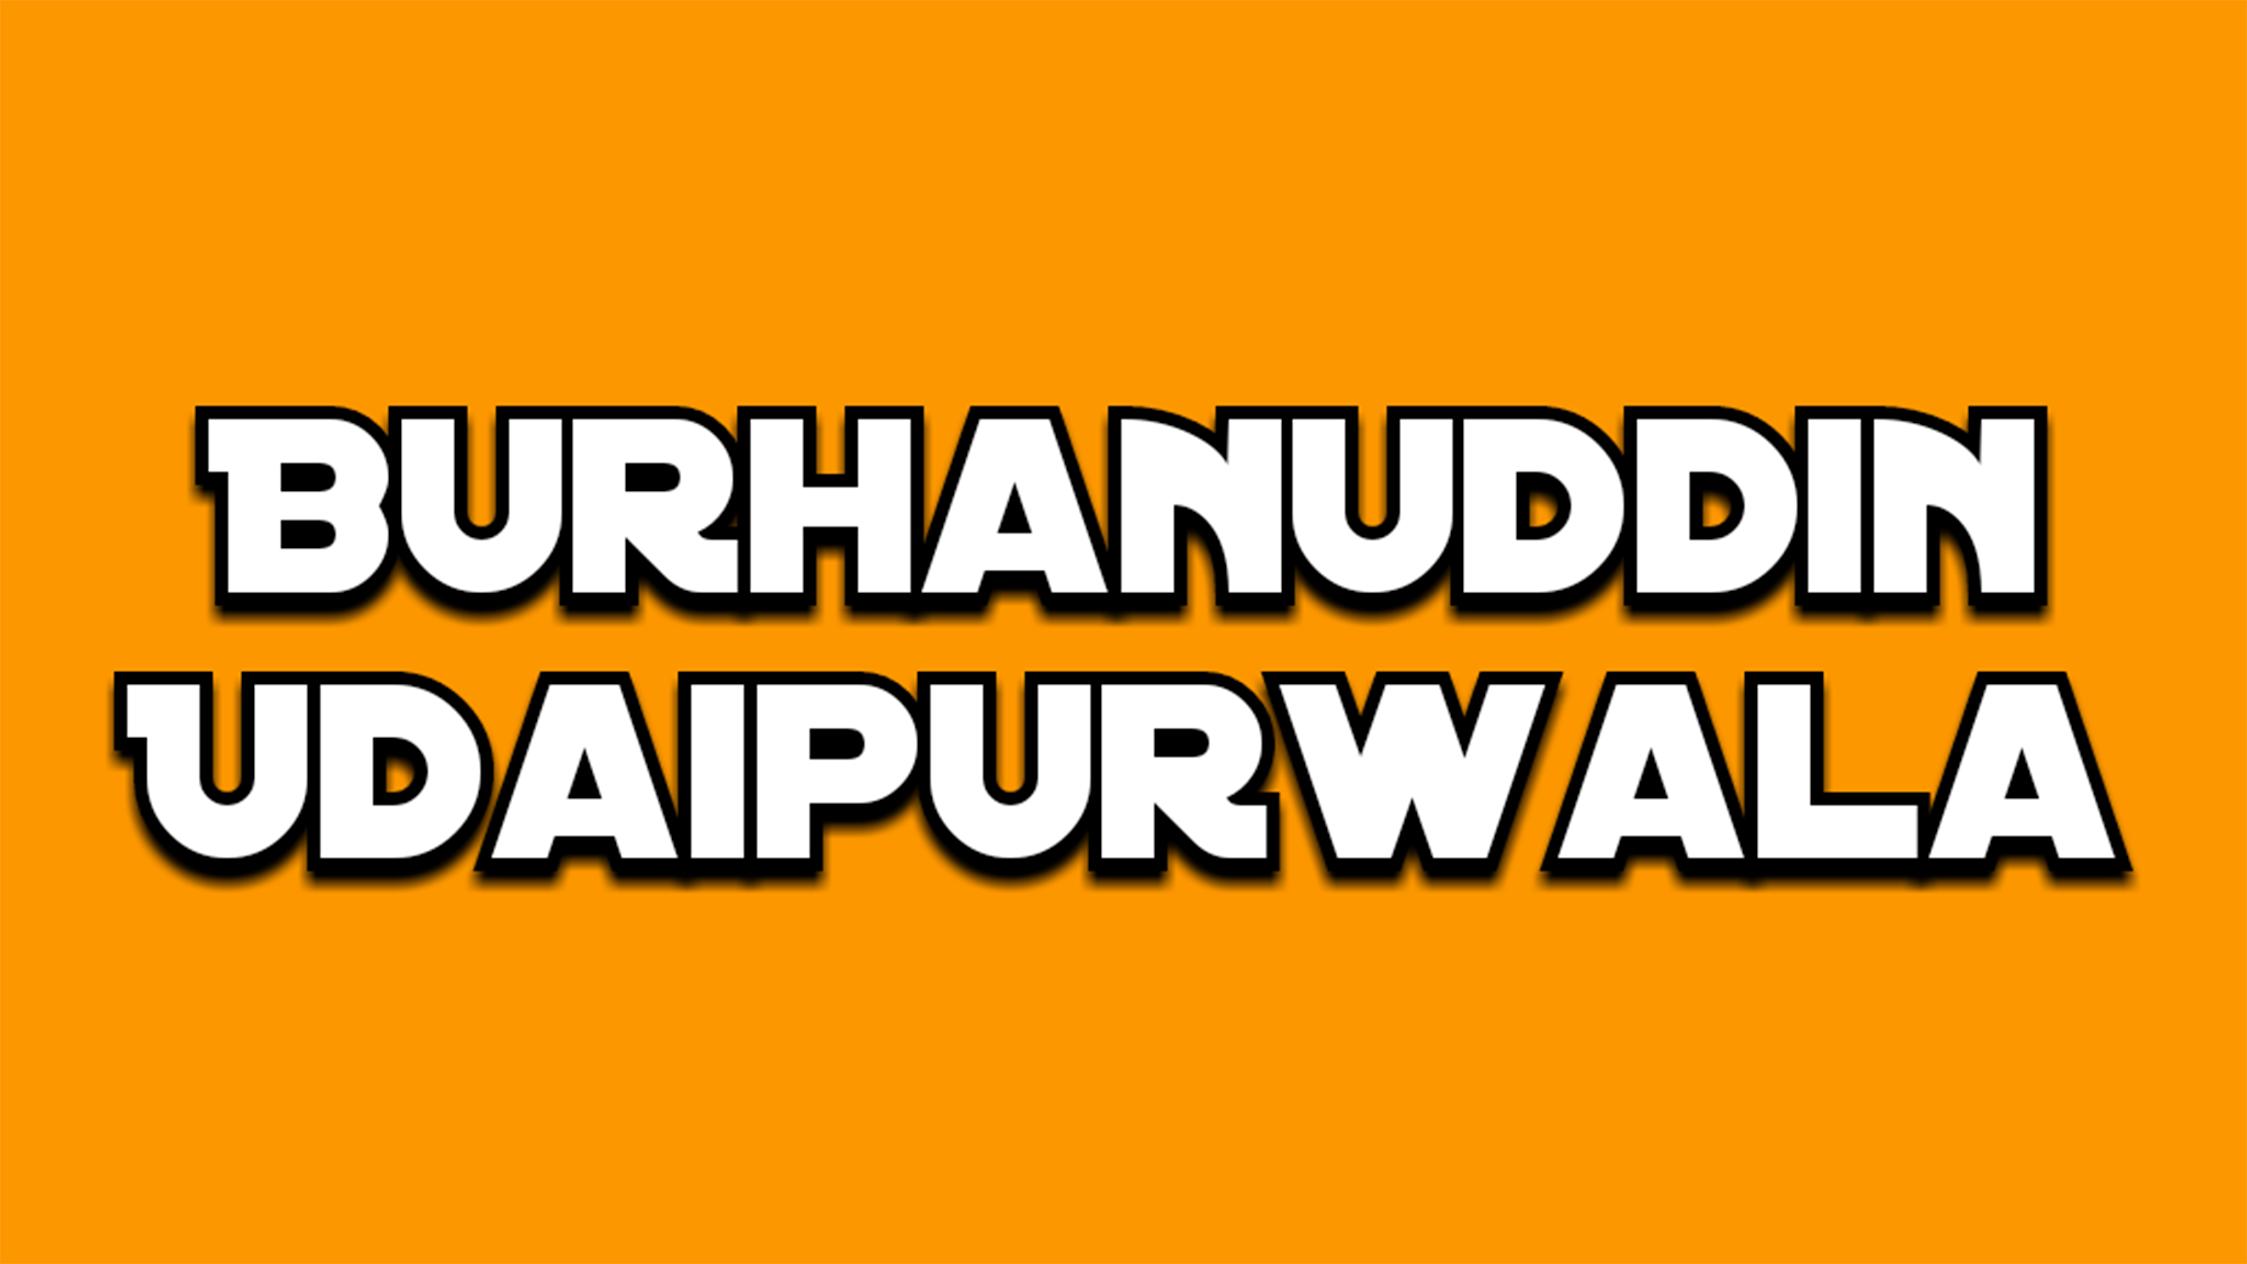 Burhanuddin Udaipurwala